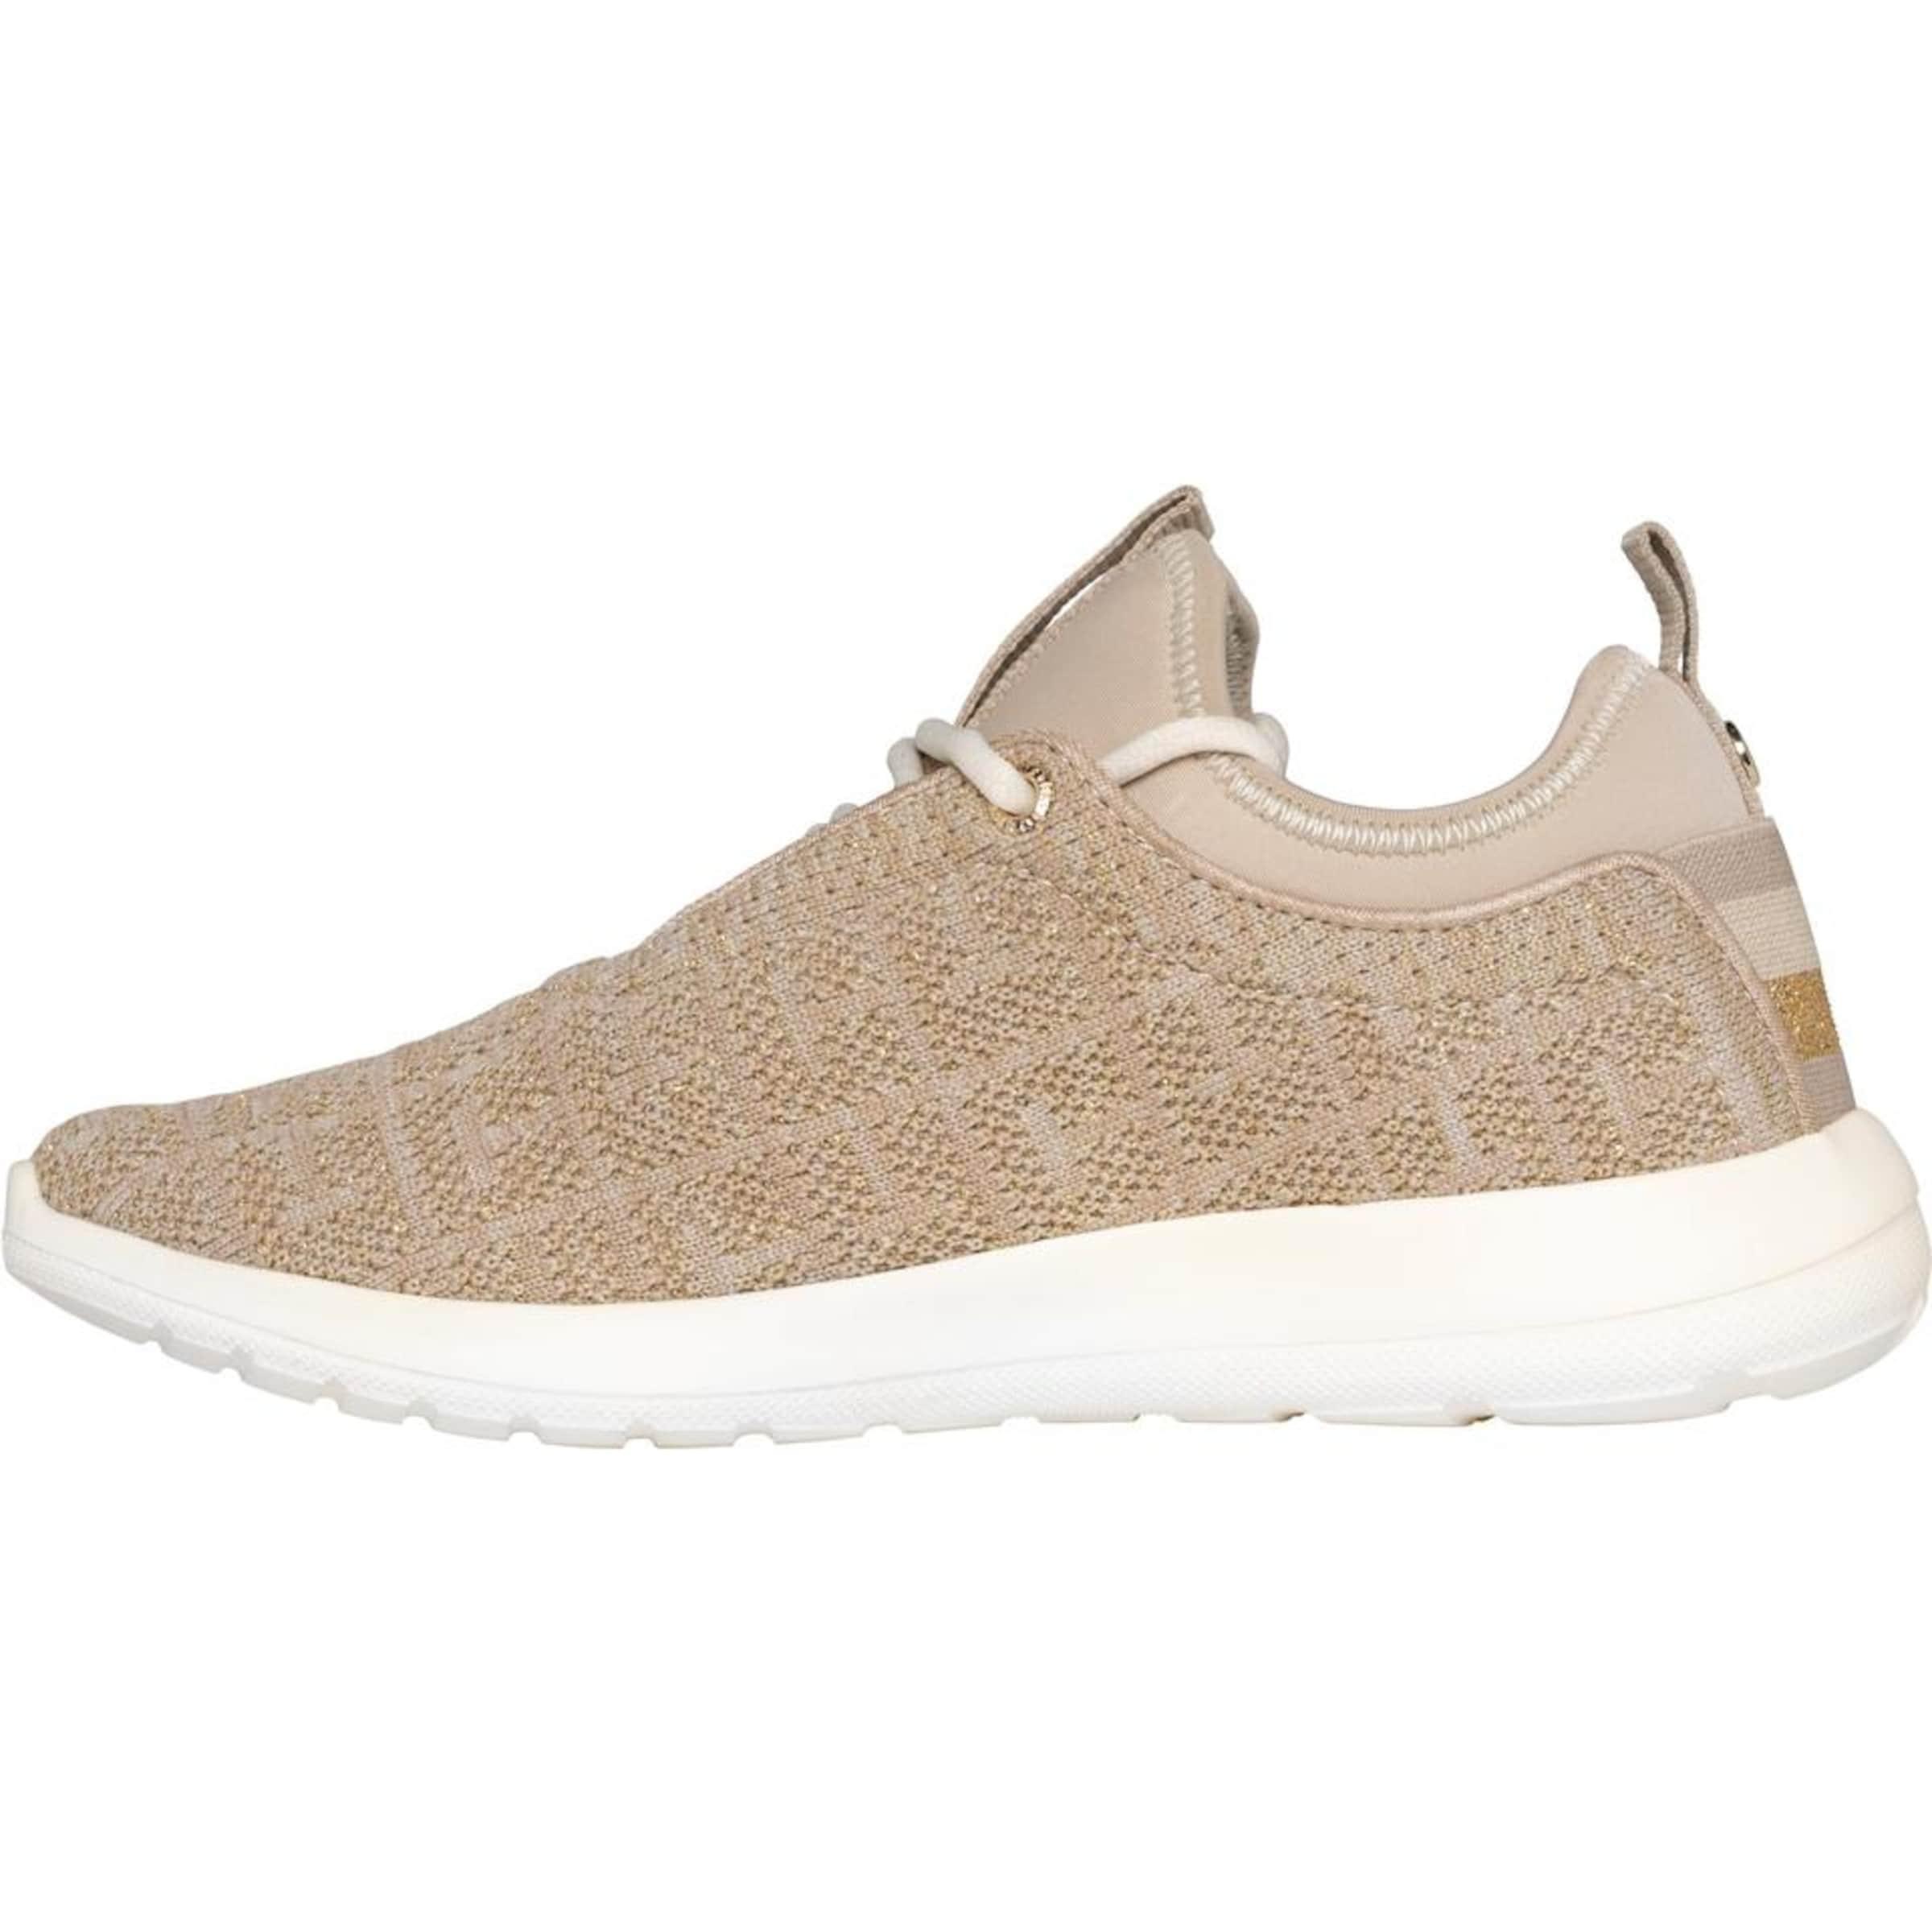 TOMMY TOMMY TOMMY HILFIGER Sneaker Verschleißfeste billige Schuhe 920991